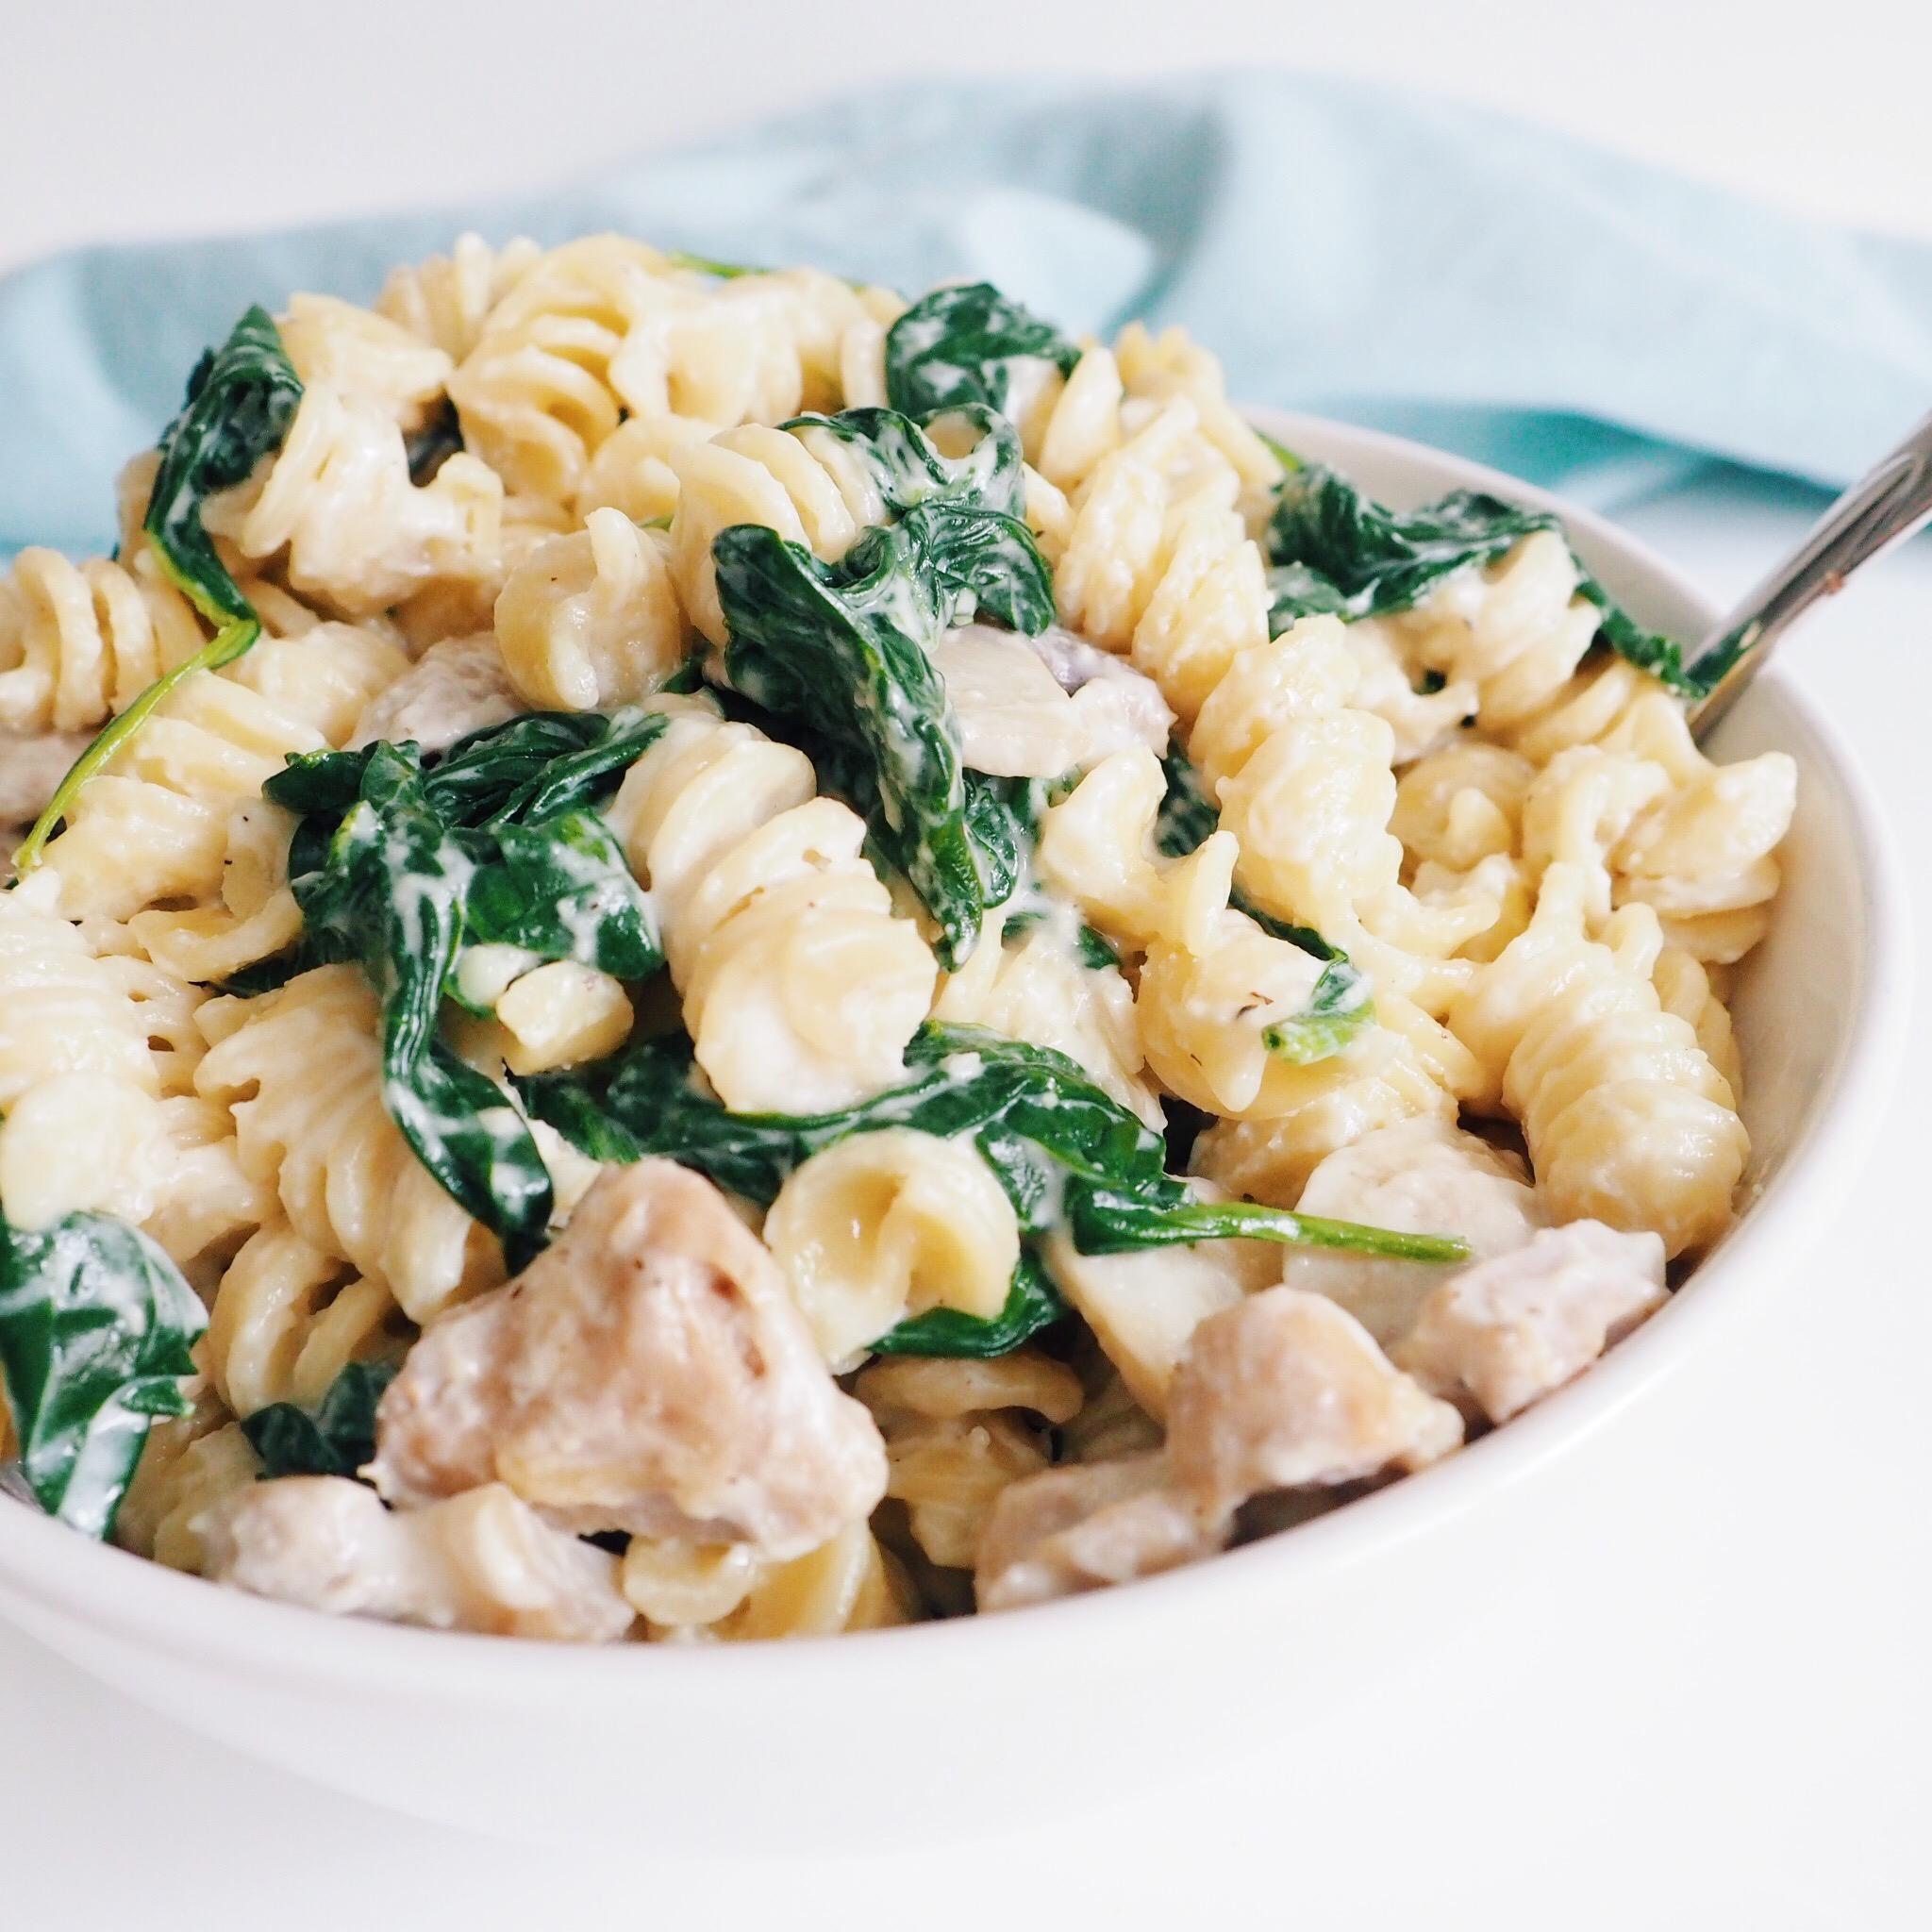 Creamy Chicken Spinach Mushroom Pasta